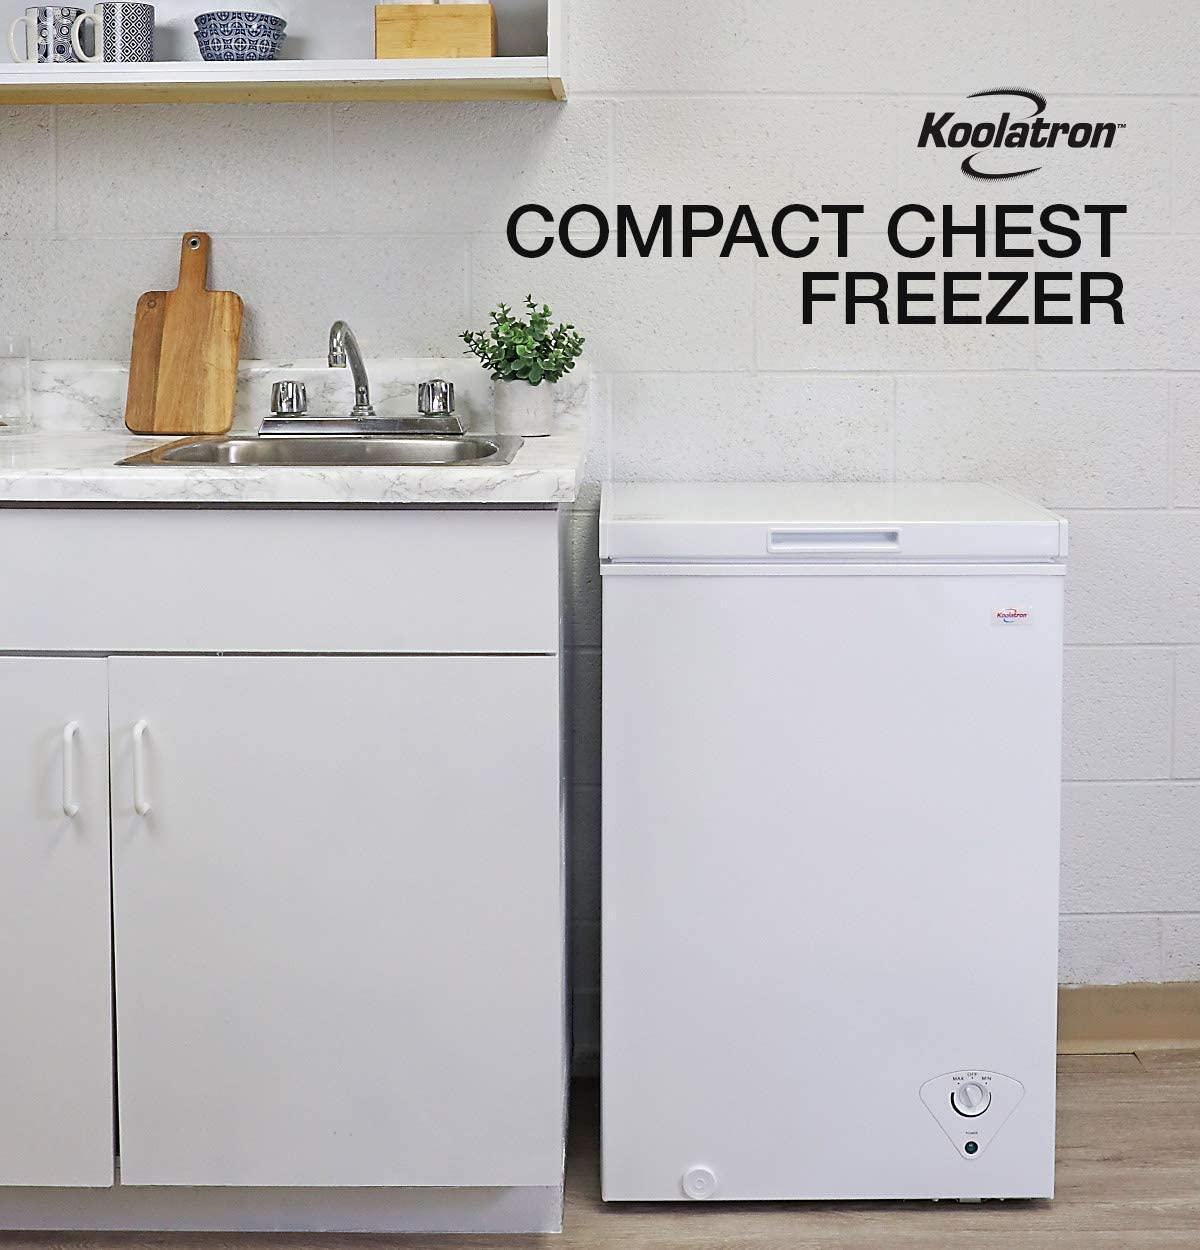 Koolatron KTCF99 3.5 Cu. Ft. (99 Liters) Chest Freezer